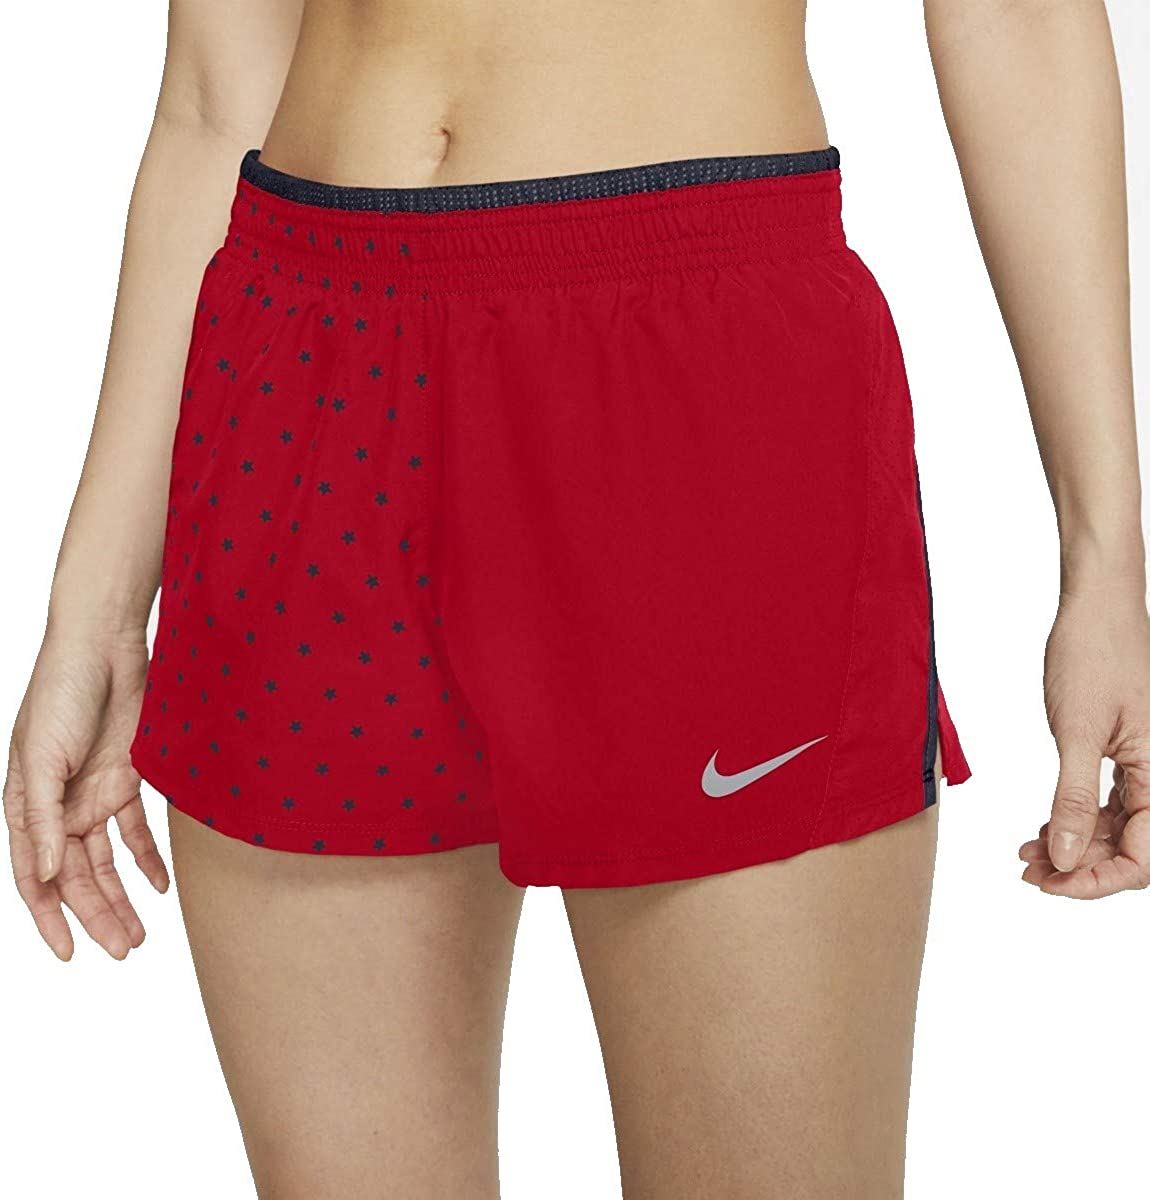 Nike Women's 10K Stars 3